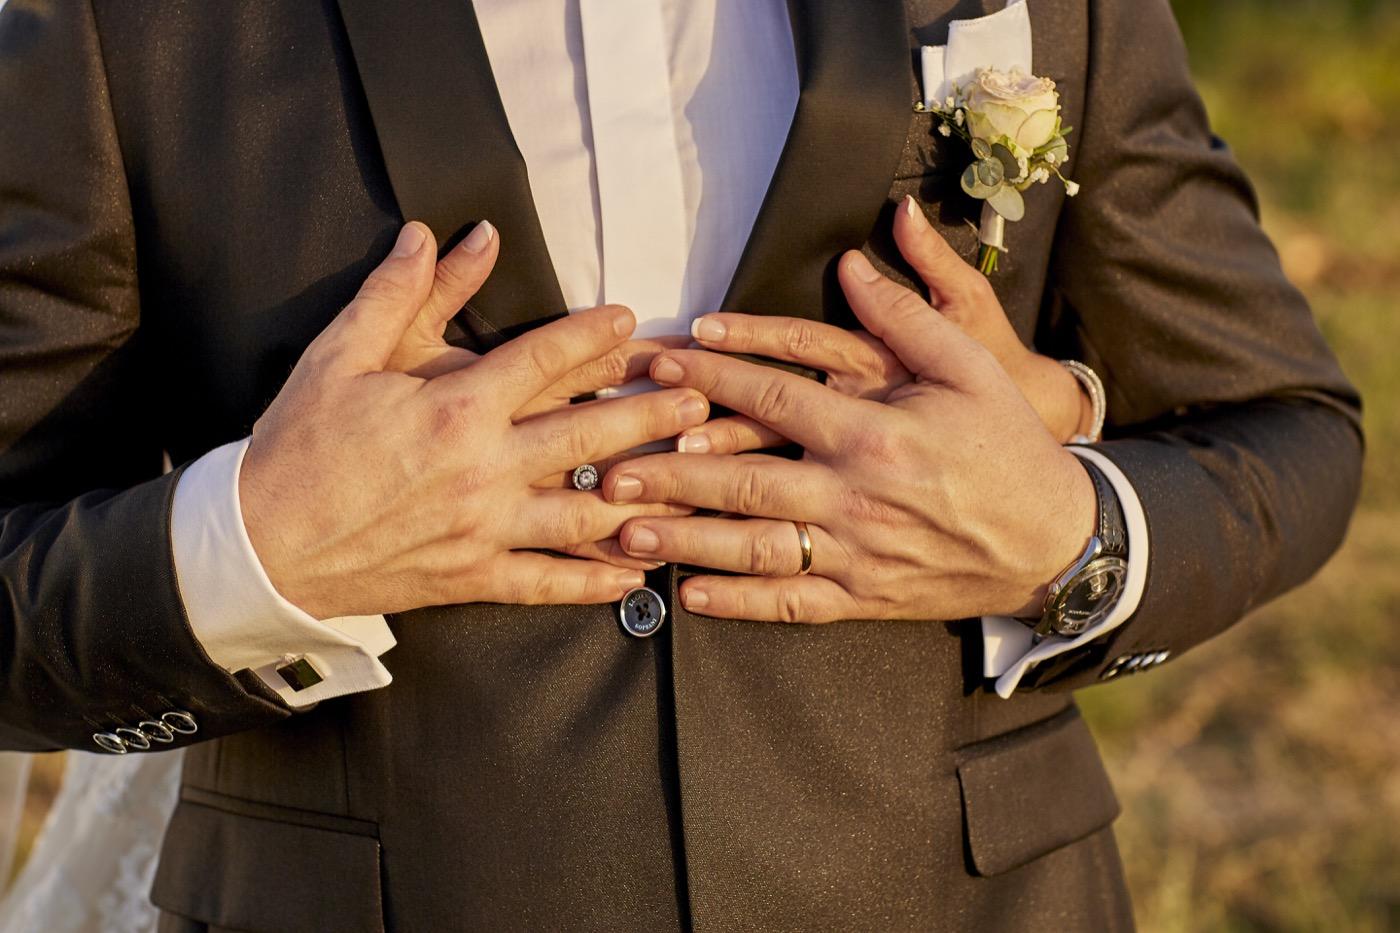 Claudio-Coppola-wedding-photographer-la-scuderia-eventi-preparativi-la-rosetta-perugia-73